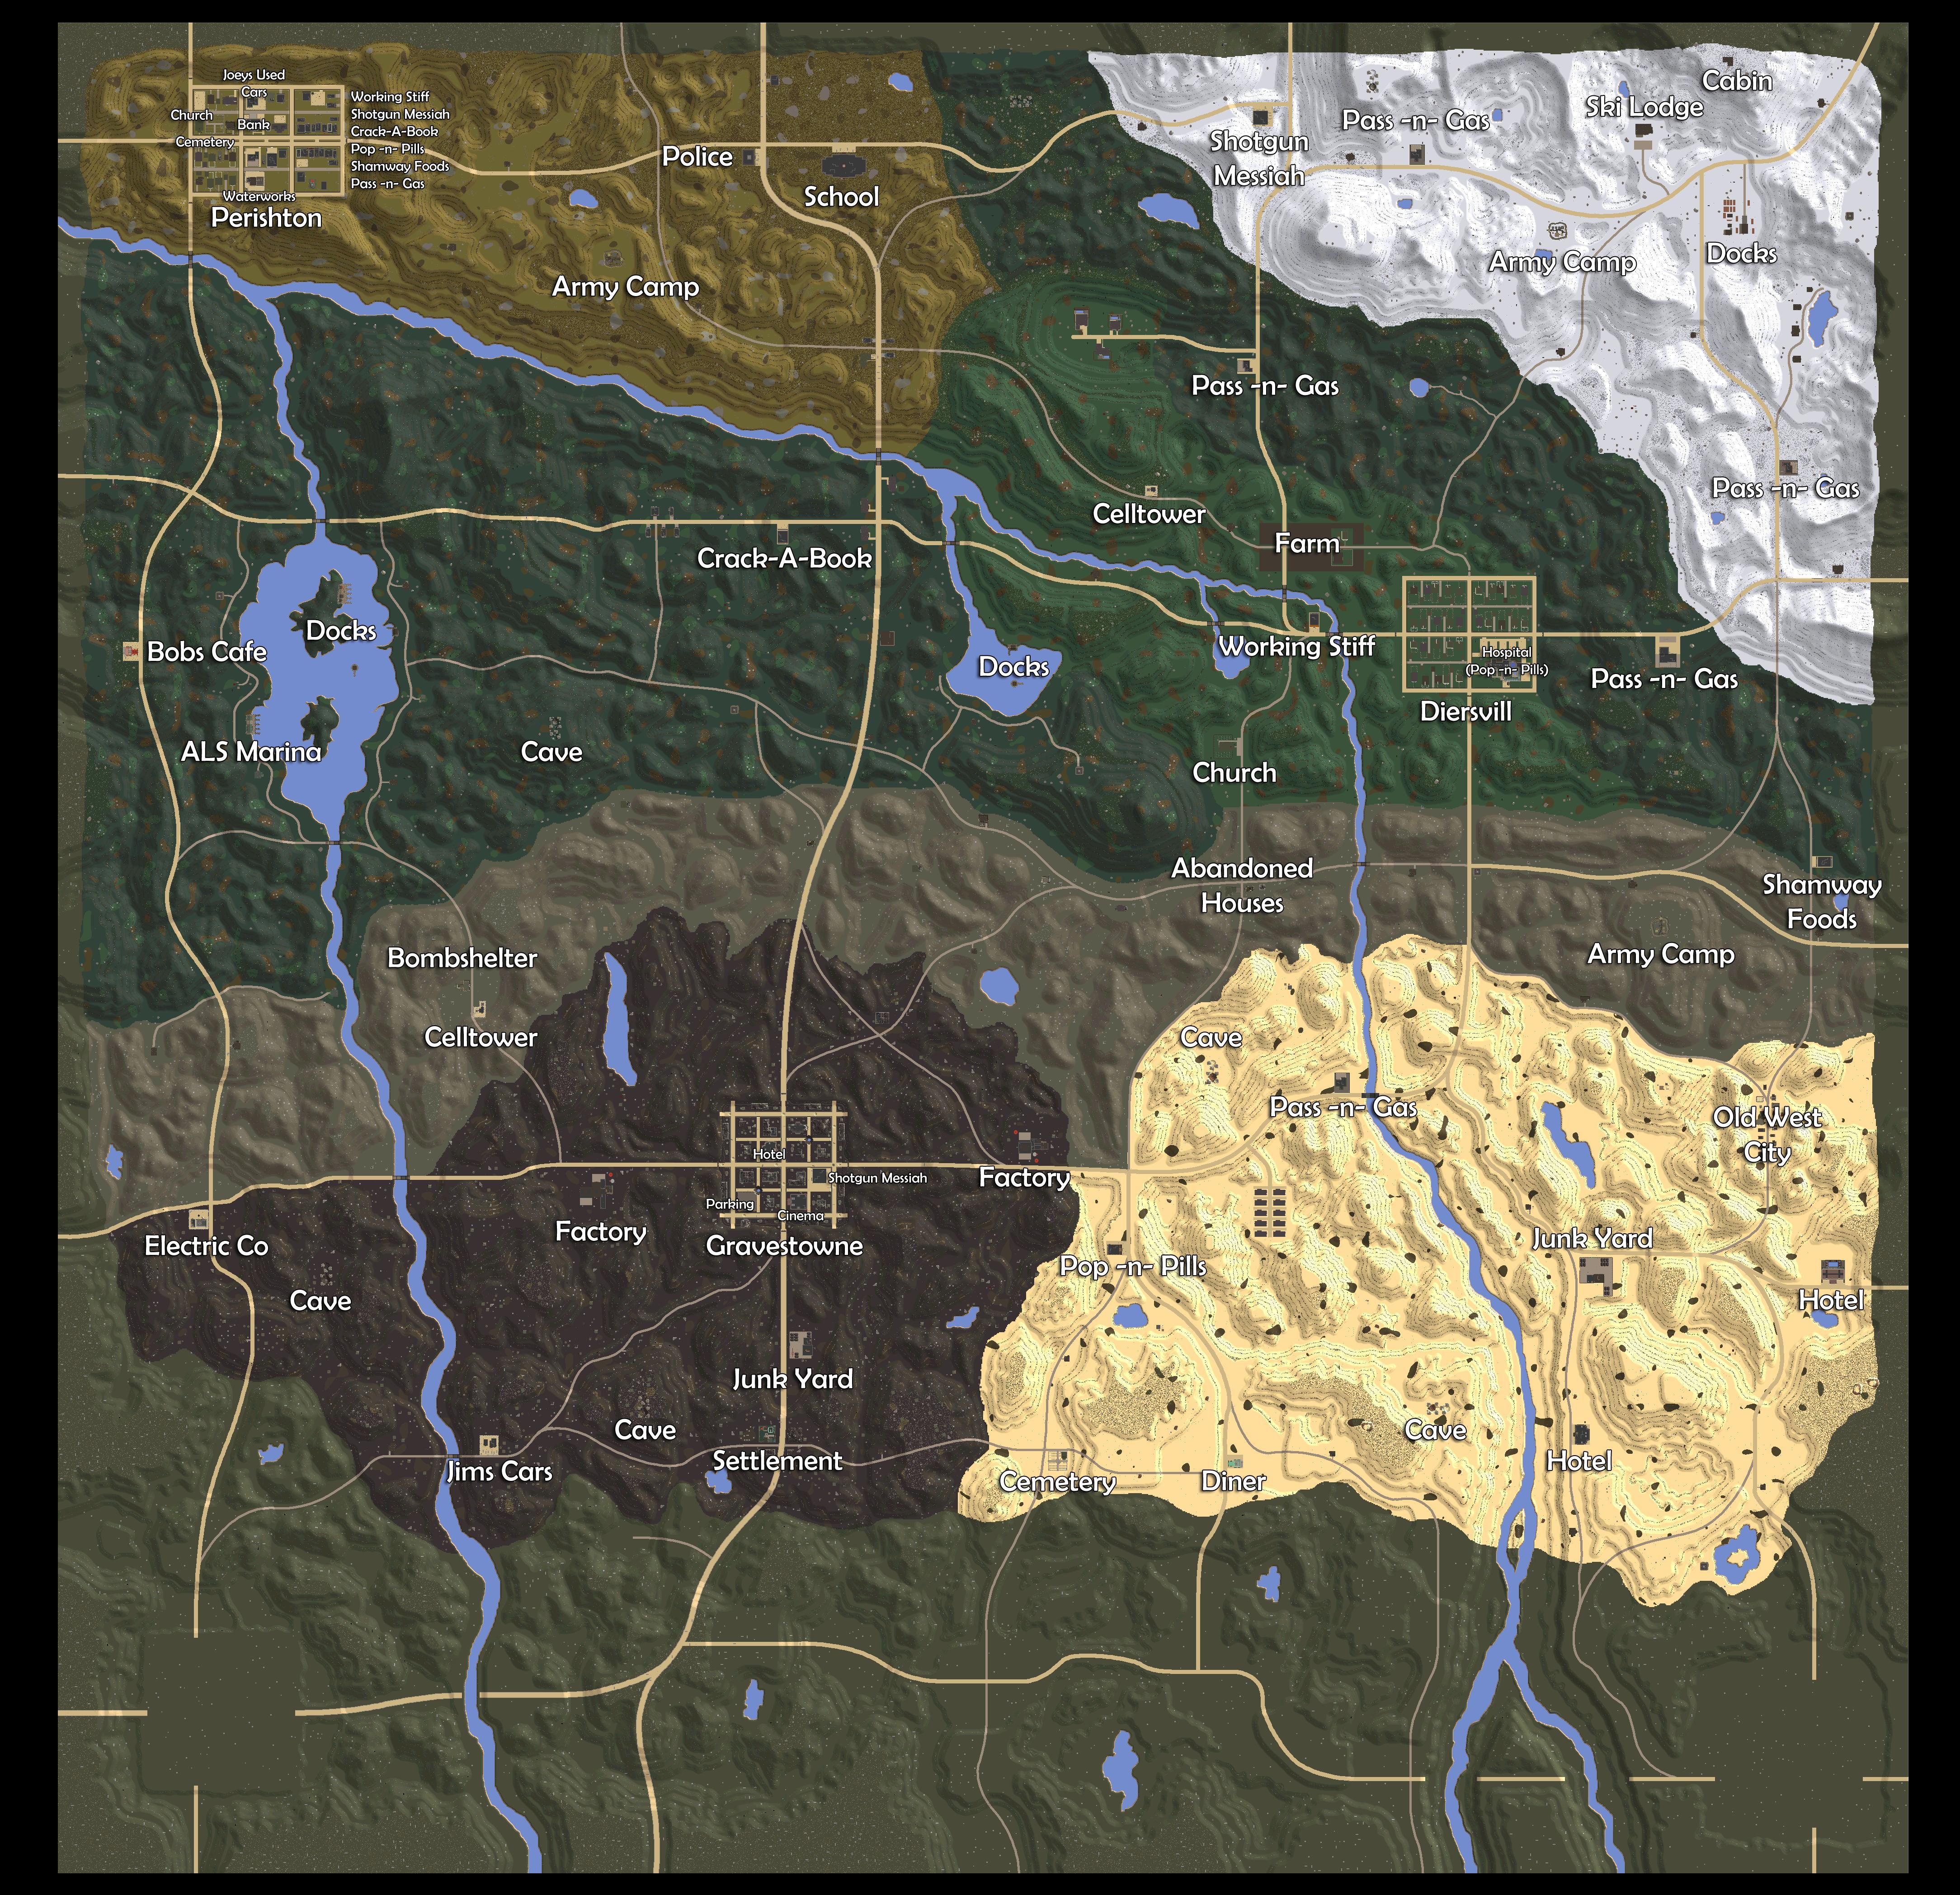 Navezgane Map Png 4 336 4 192 Pixels 7 Days To Die Map Day